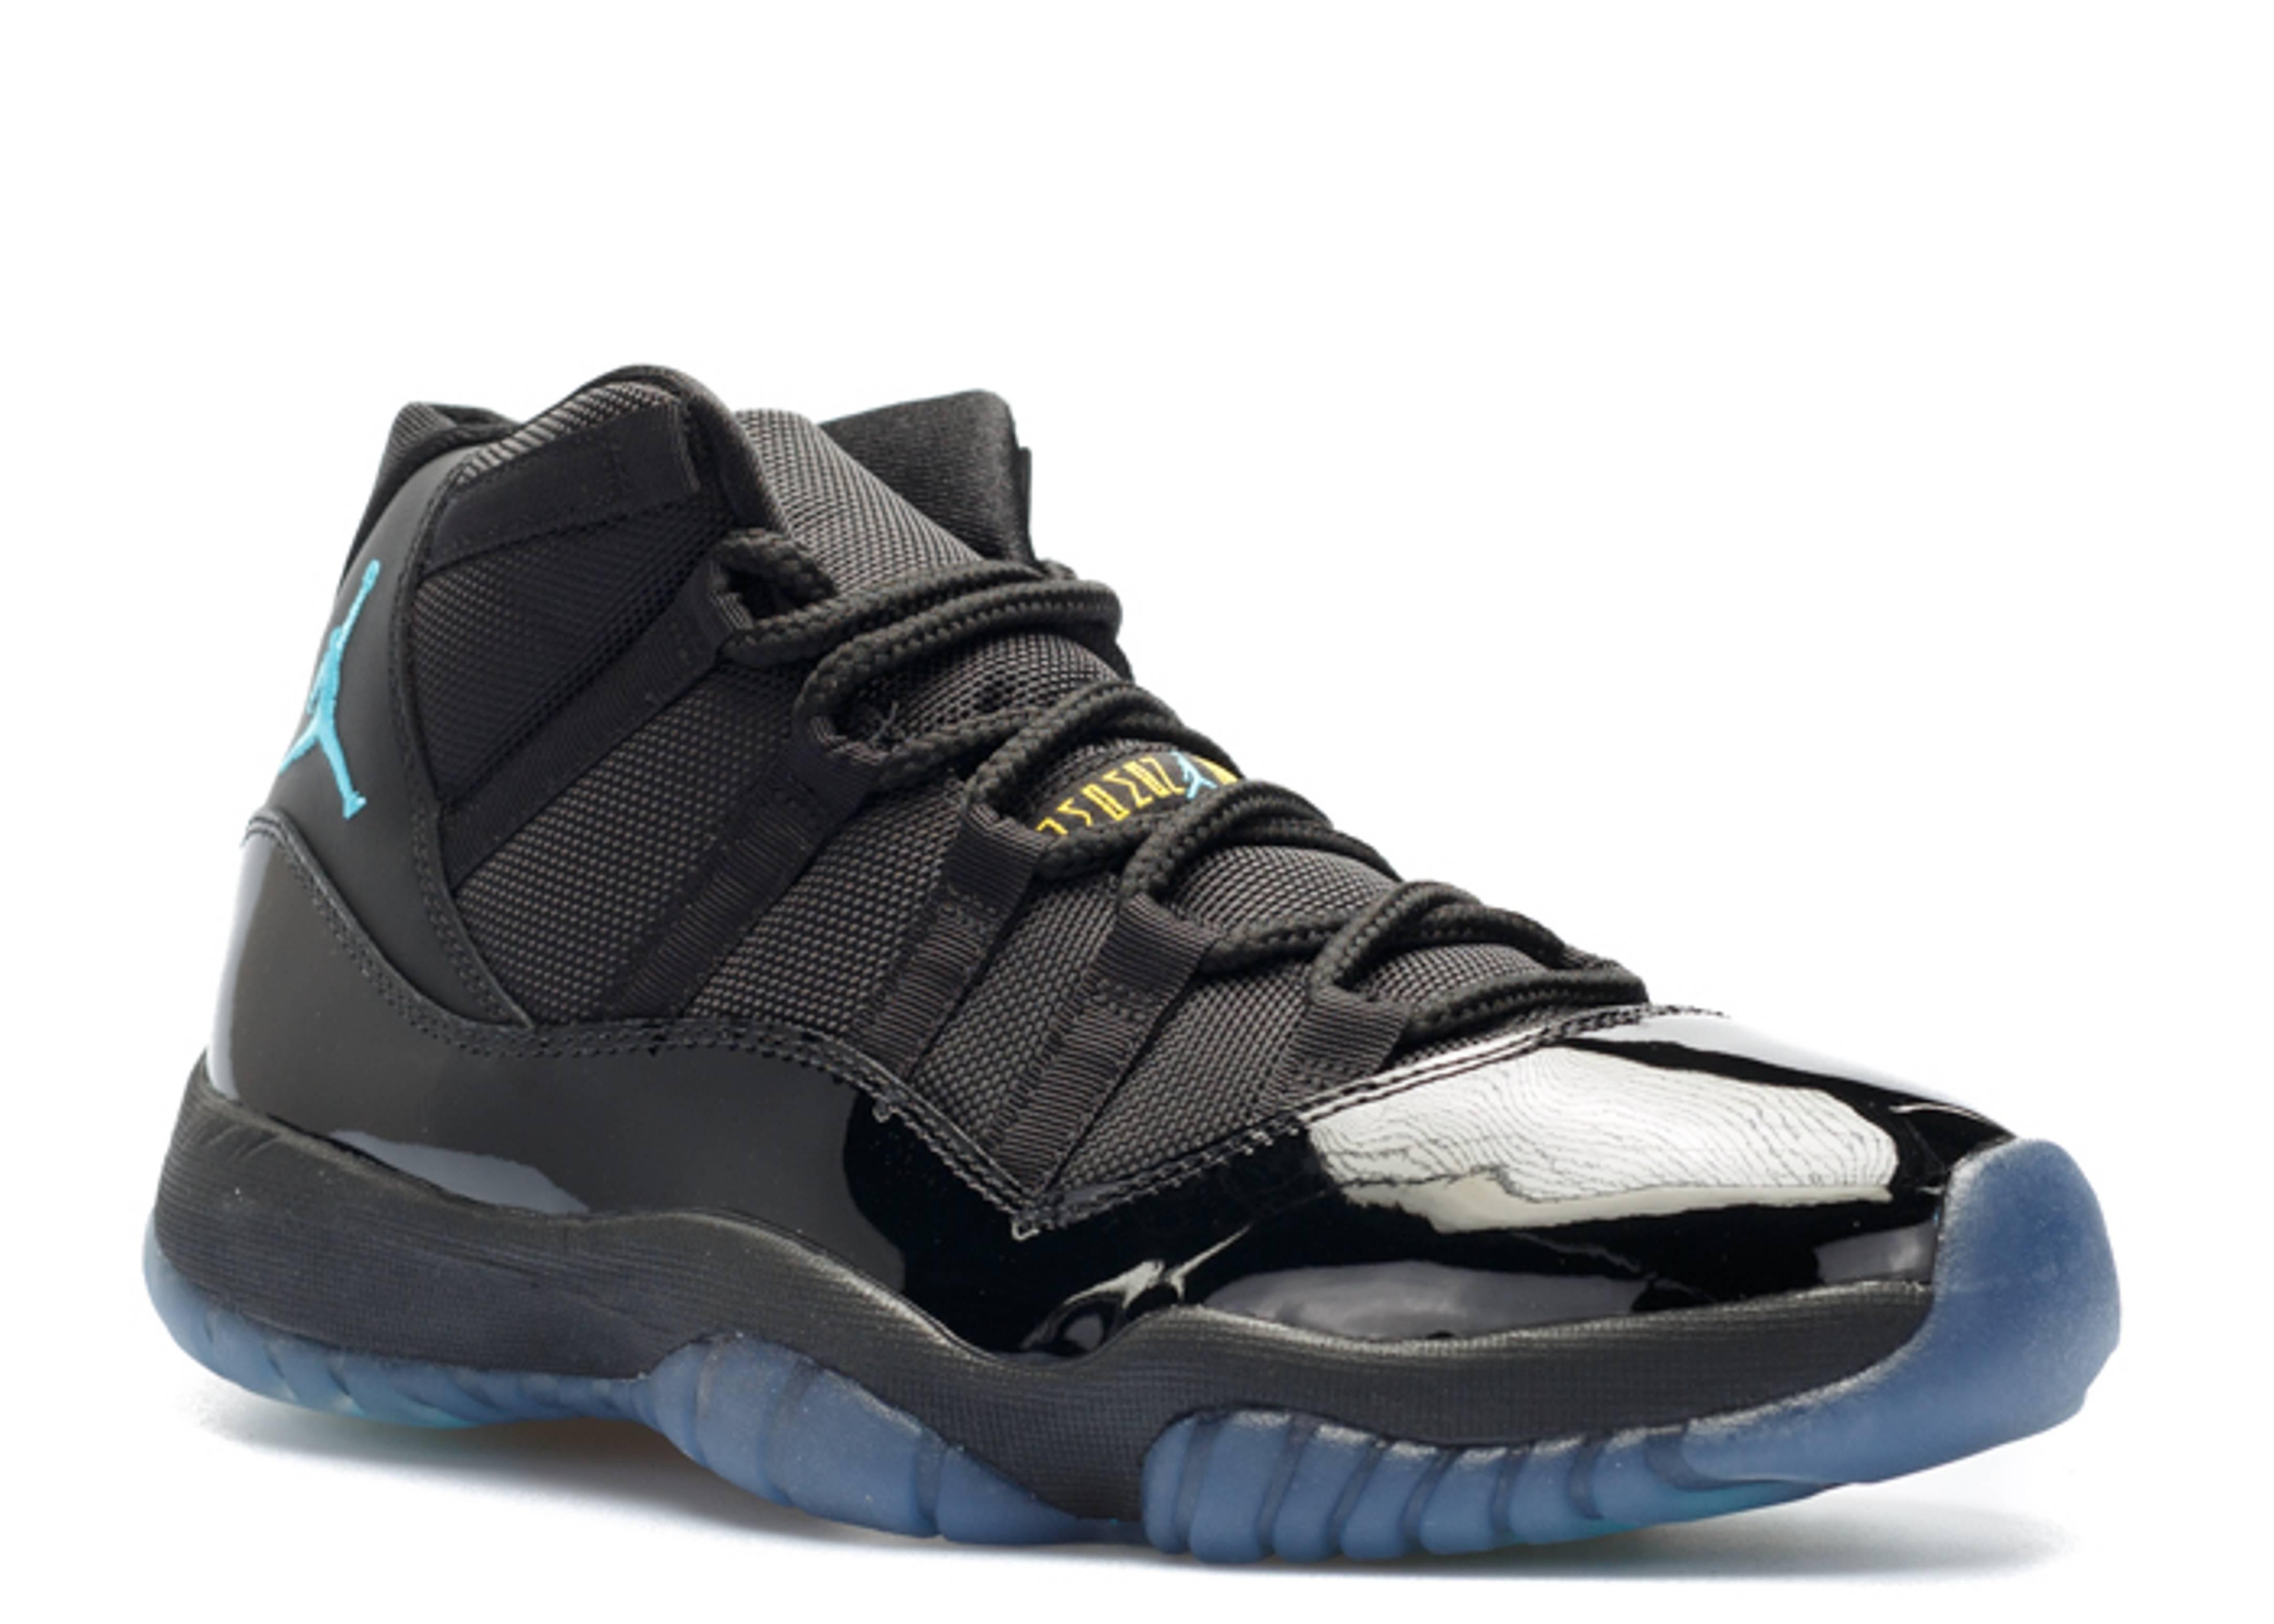 Jordans 11